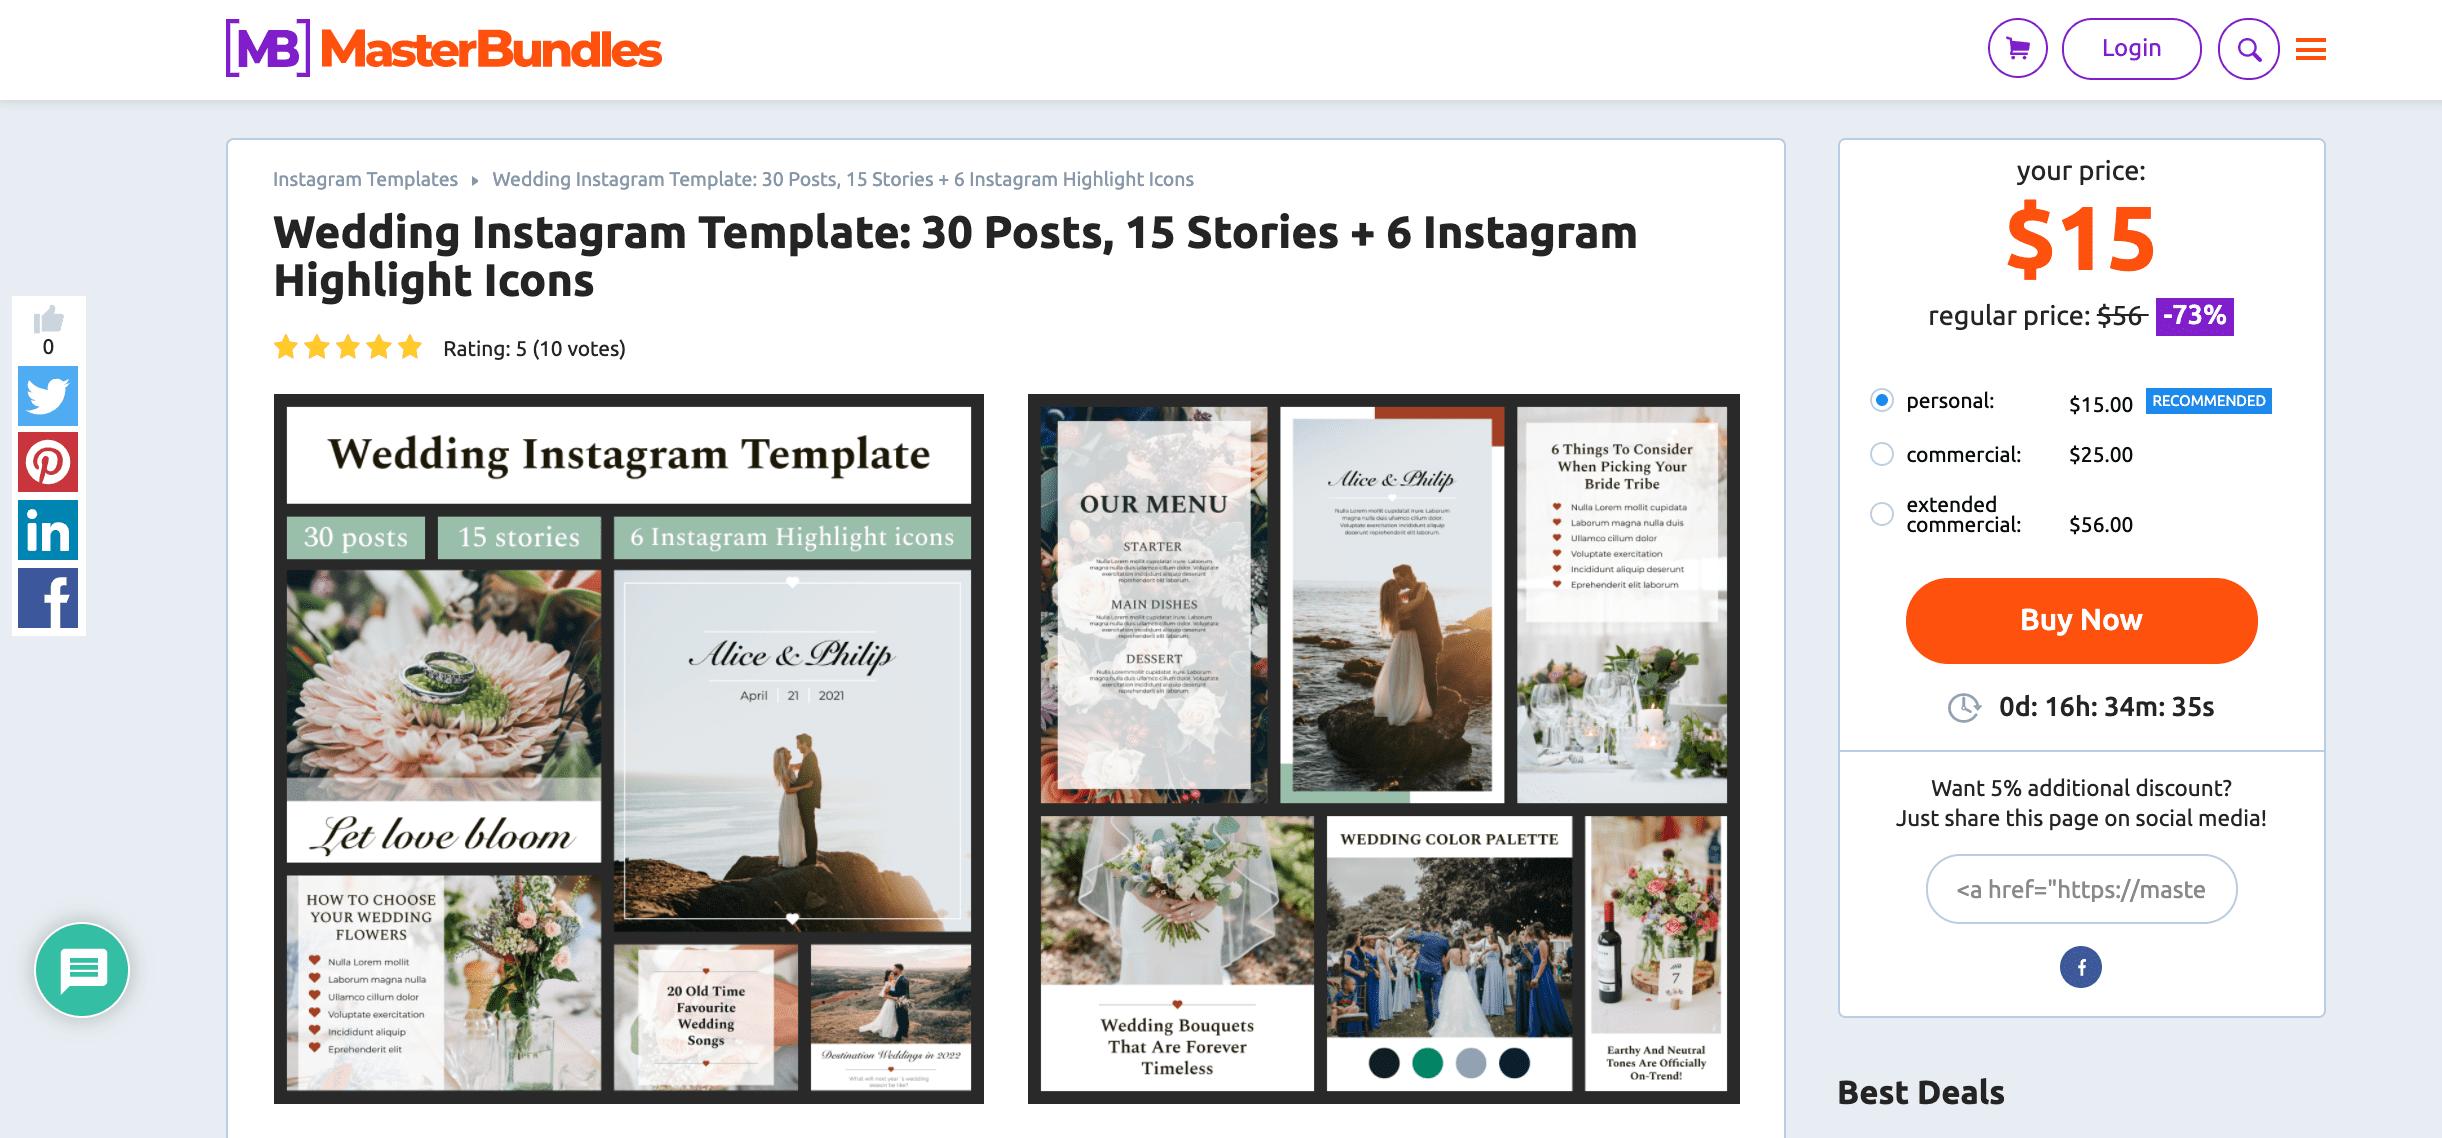 MasterBundles Wedding Instagram Template. Site Screenshot.